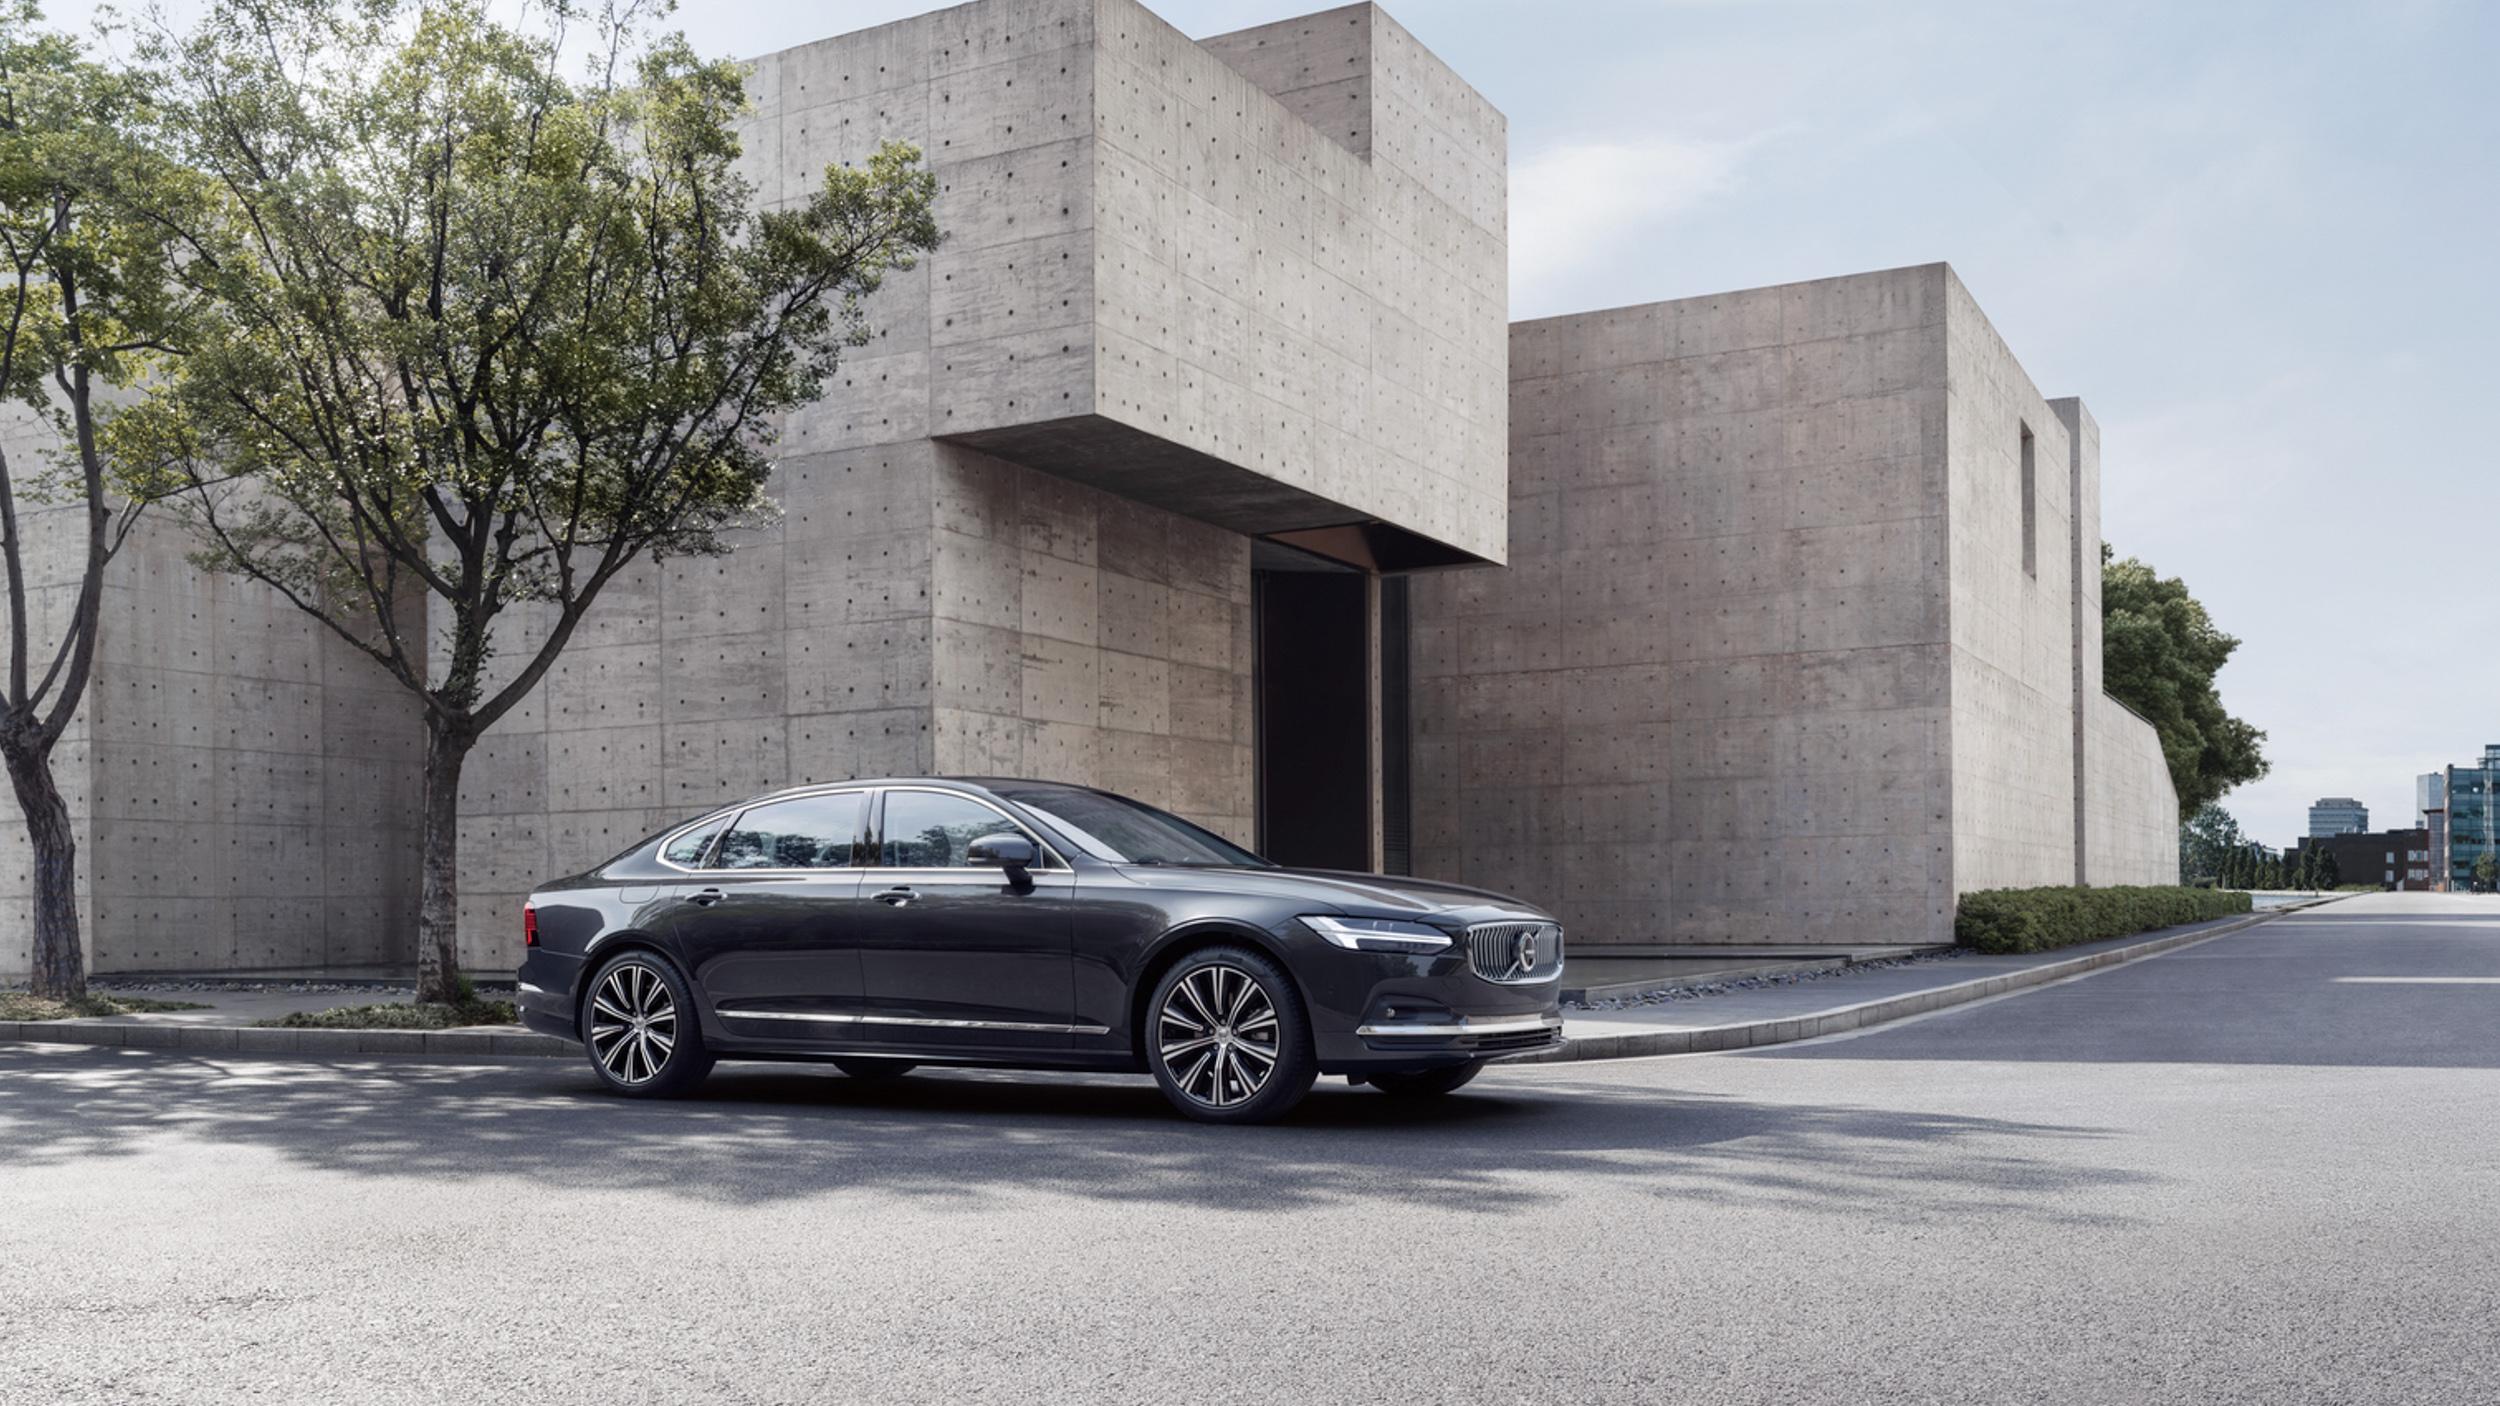 Volvo S90 拉長車身進化上市!三車型選擇售價 239 萬元起